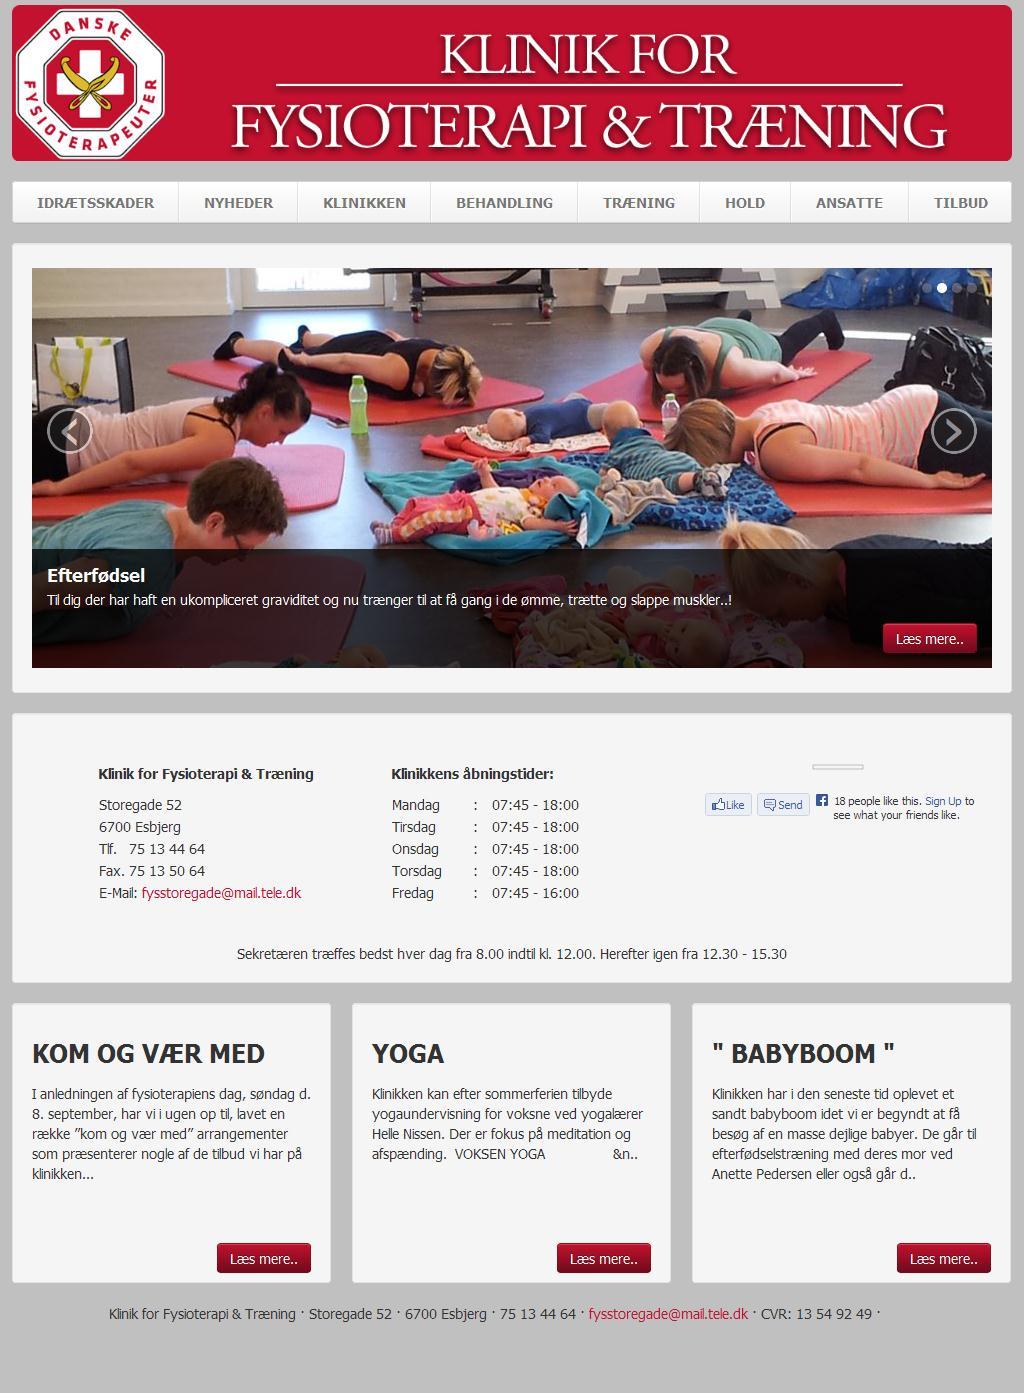 Klinik for Fysioterapi & Træning